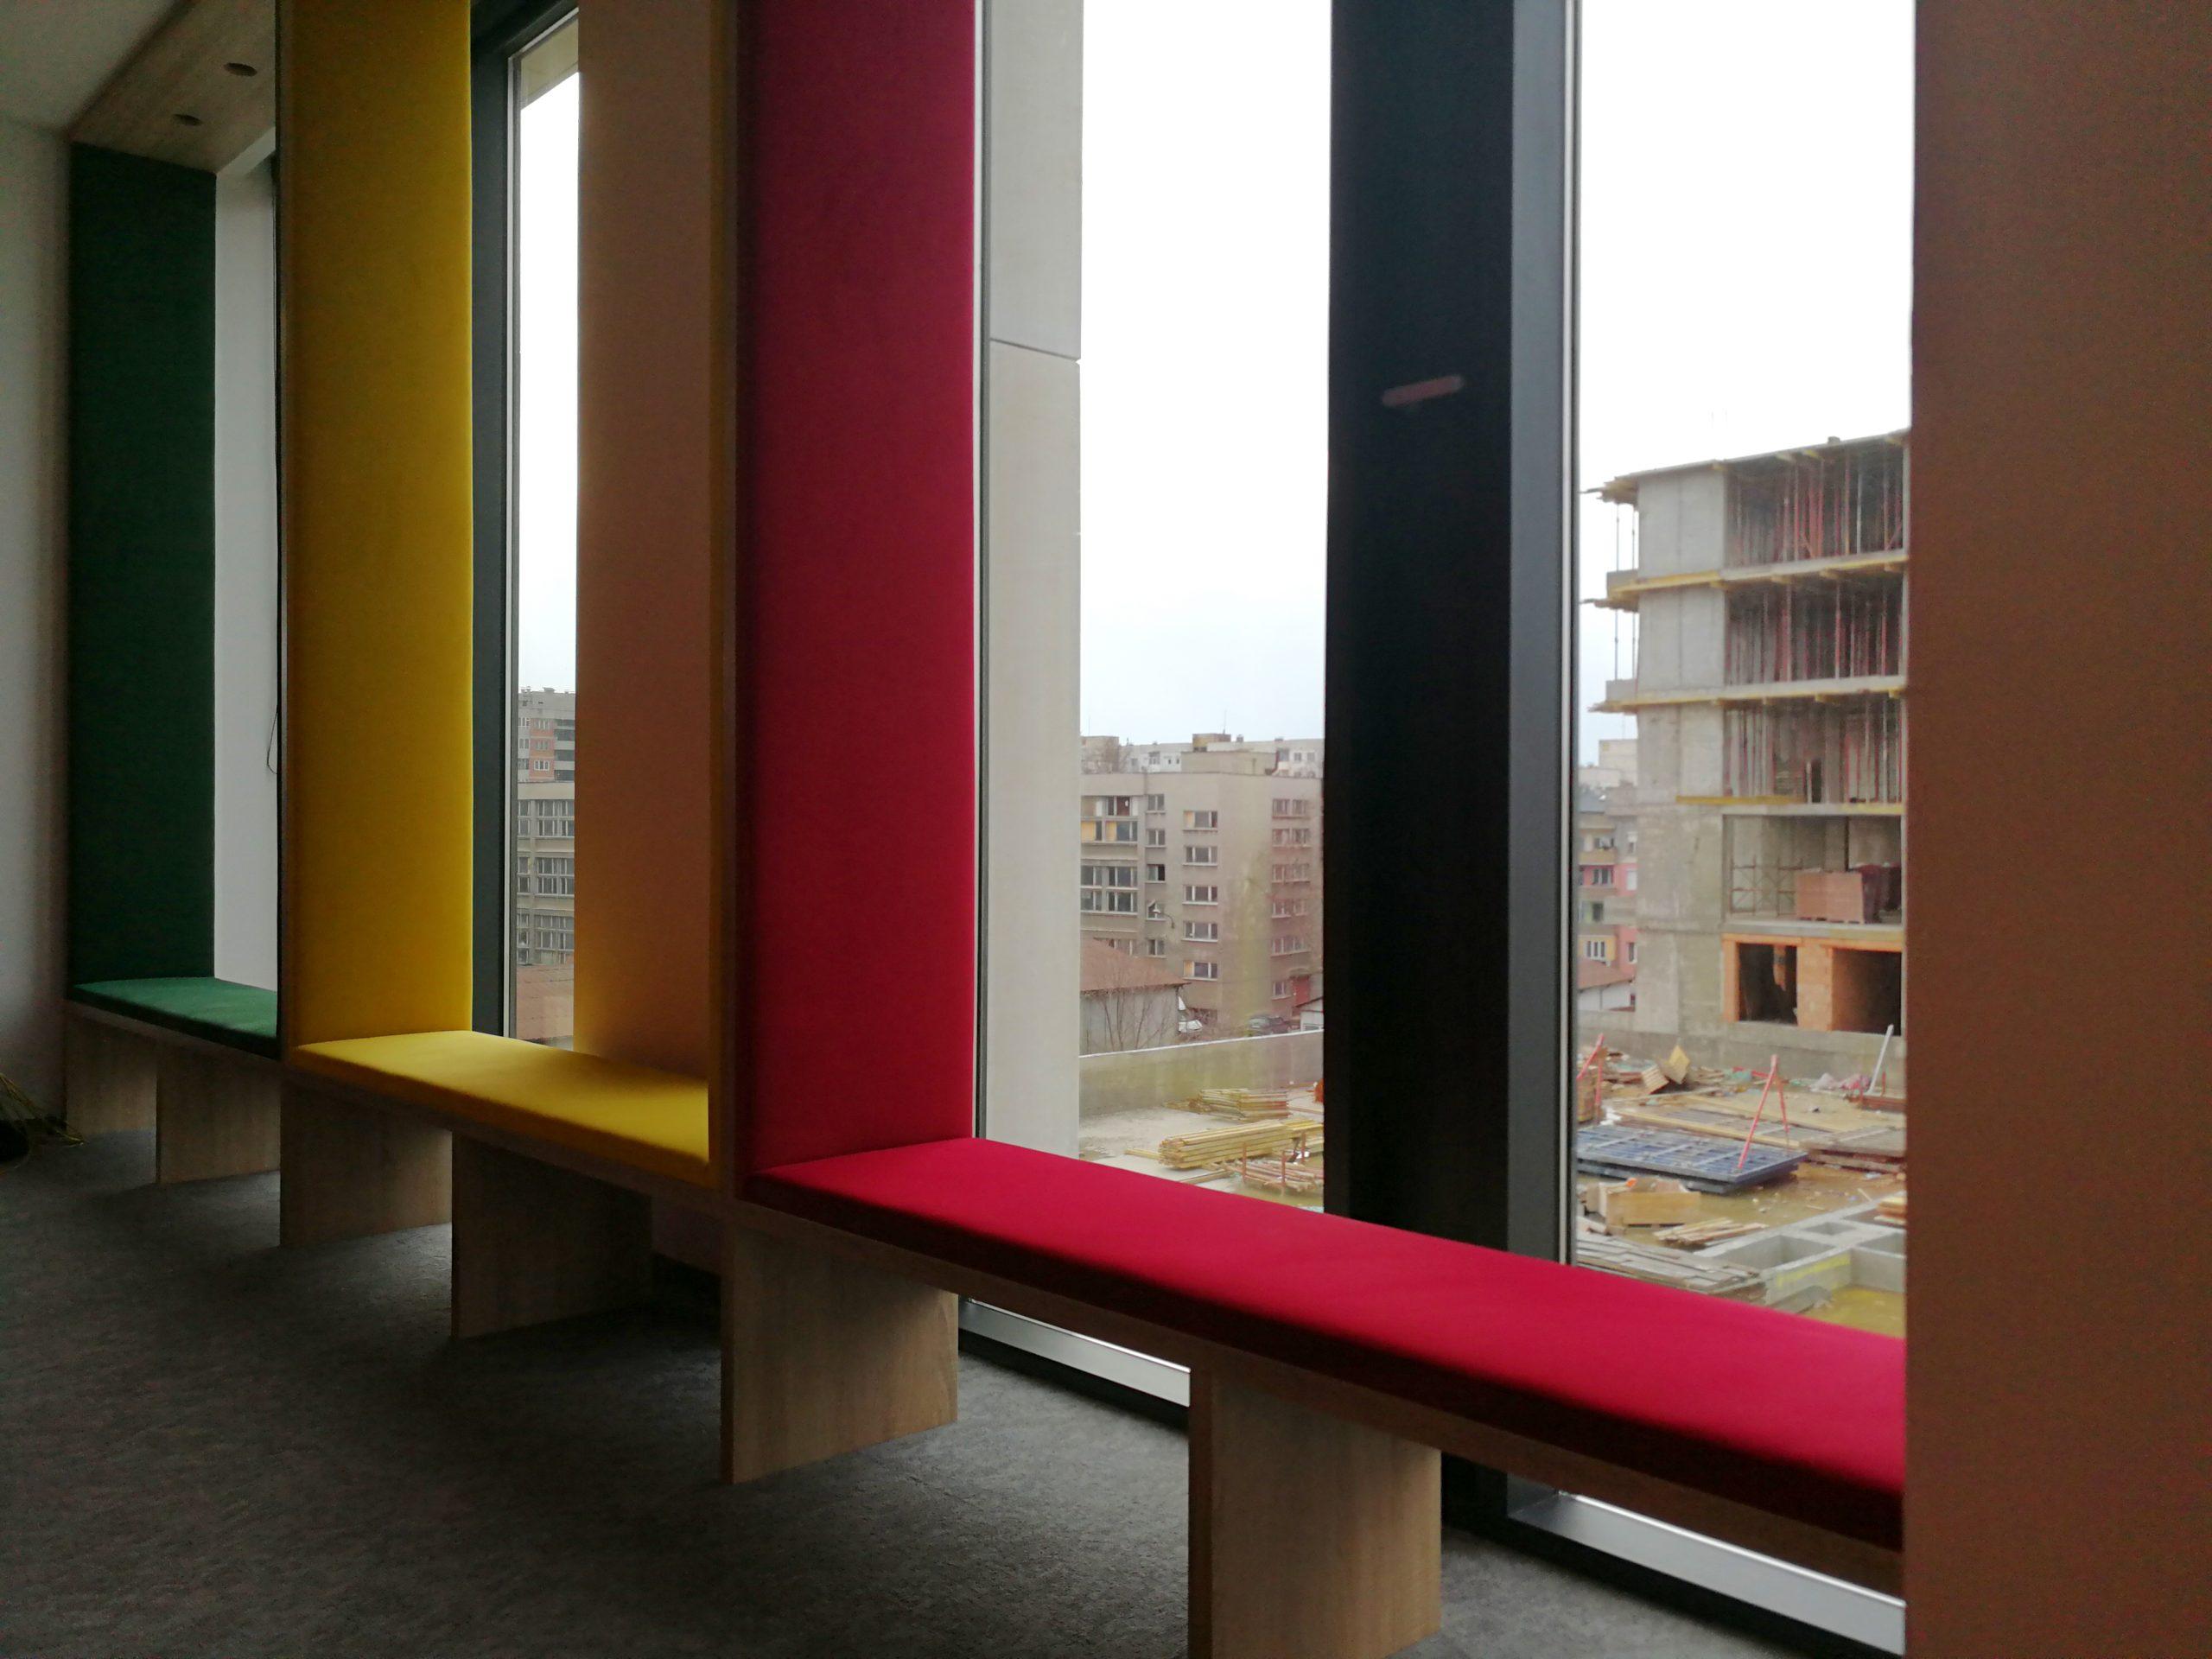 Windows seating area